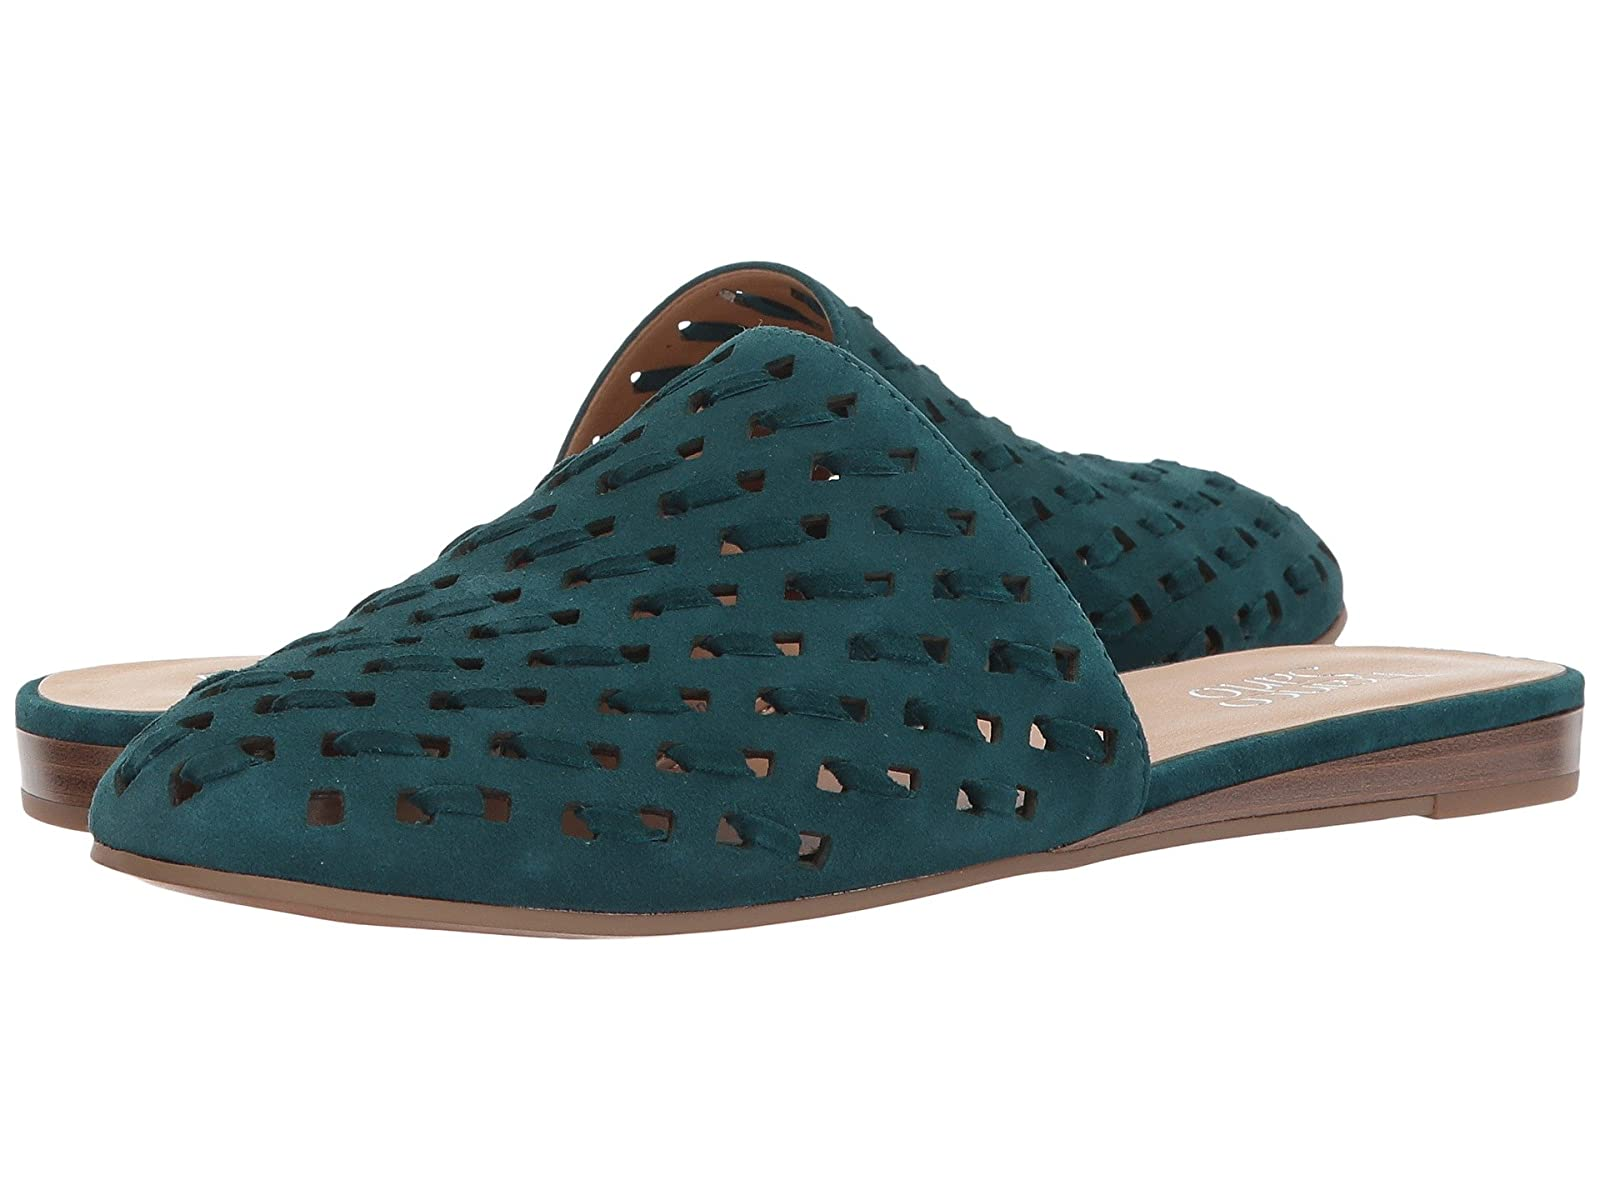 Franco Sarto Glena 2Cheap and distinctive eye-catching shoes